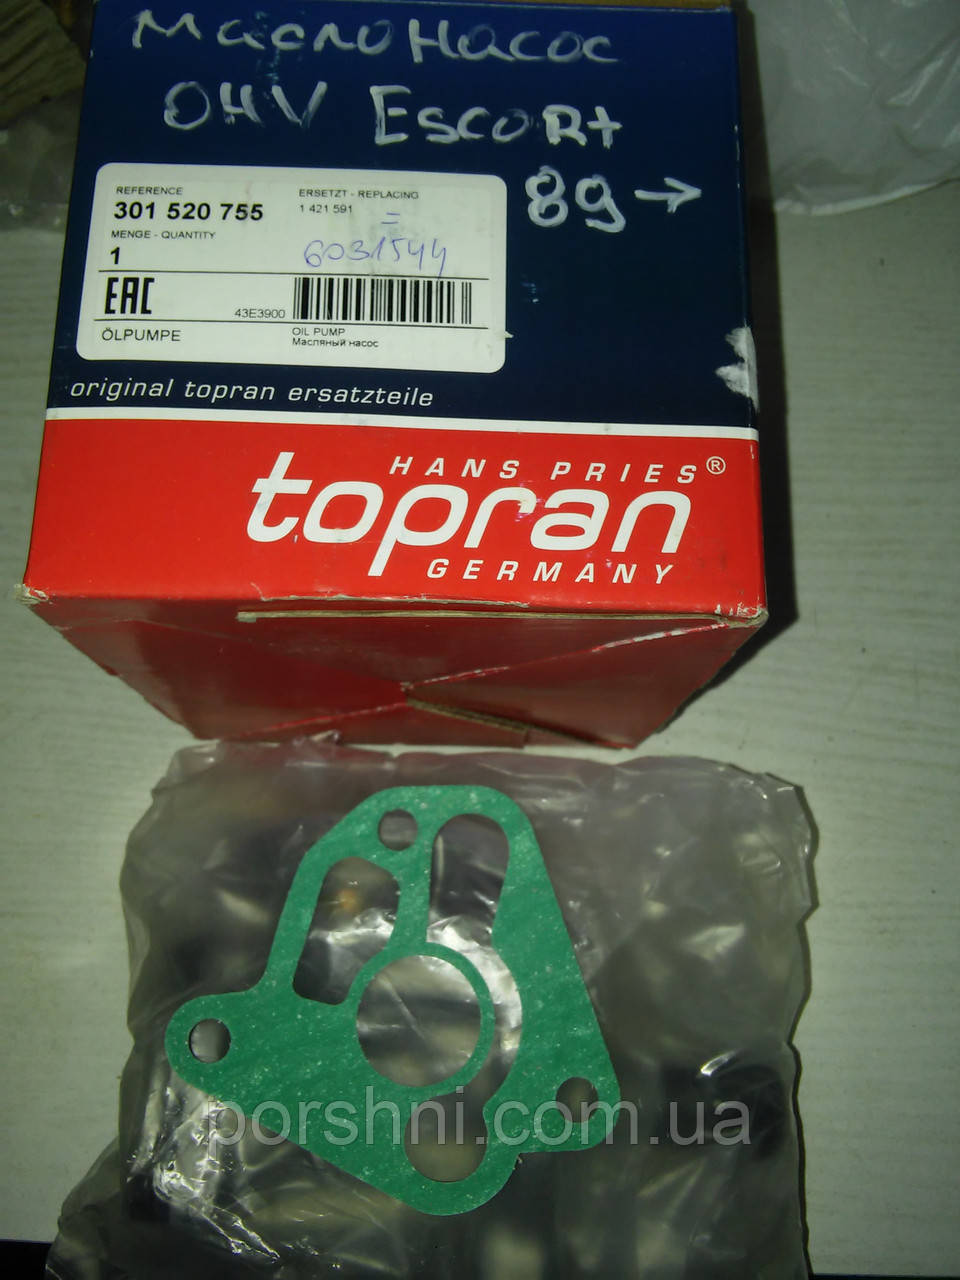 Маслонасос  1.1 Fiesta  OHV -- 89 г.  Escort  1.3 OHV 89 -- Topran 301 520  N:6031544